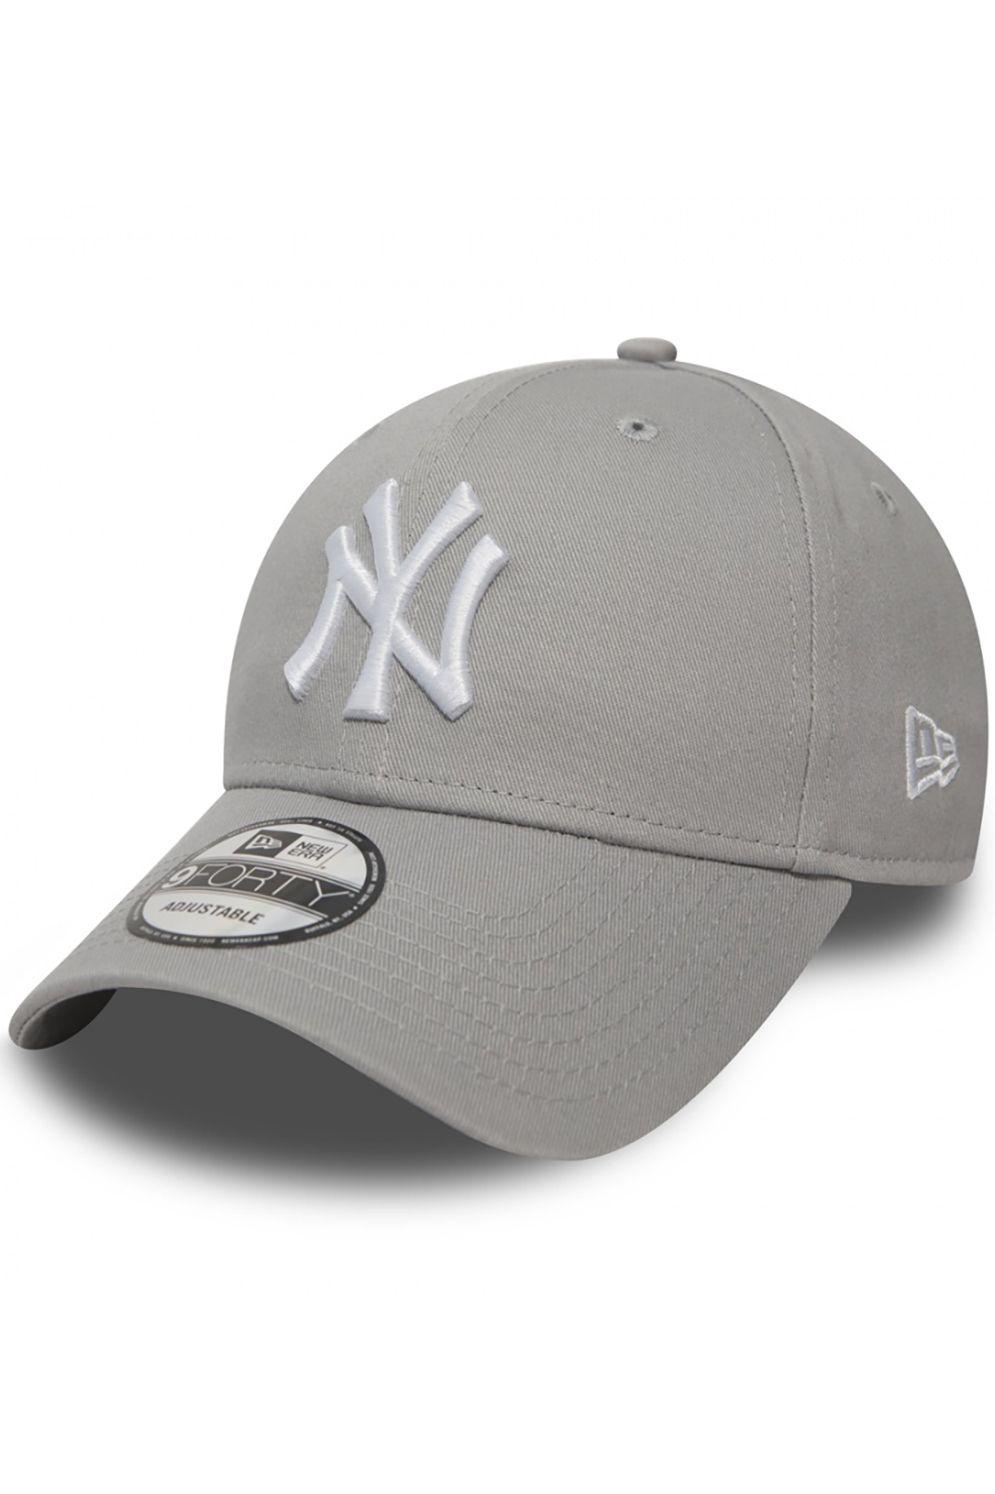 New Era Cap   940 LEAGUE BASIC NEW YORK YANKEES Grey/White